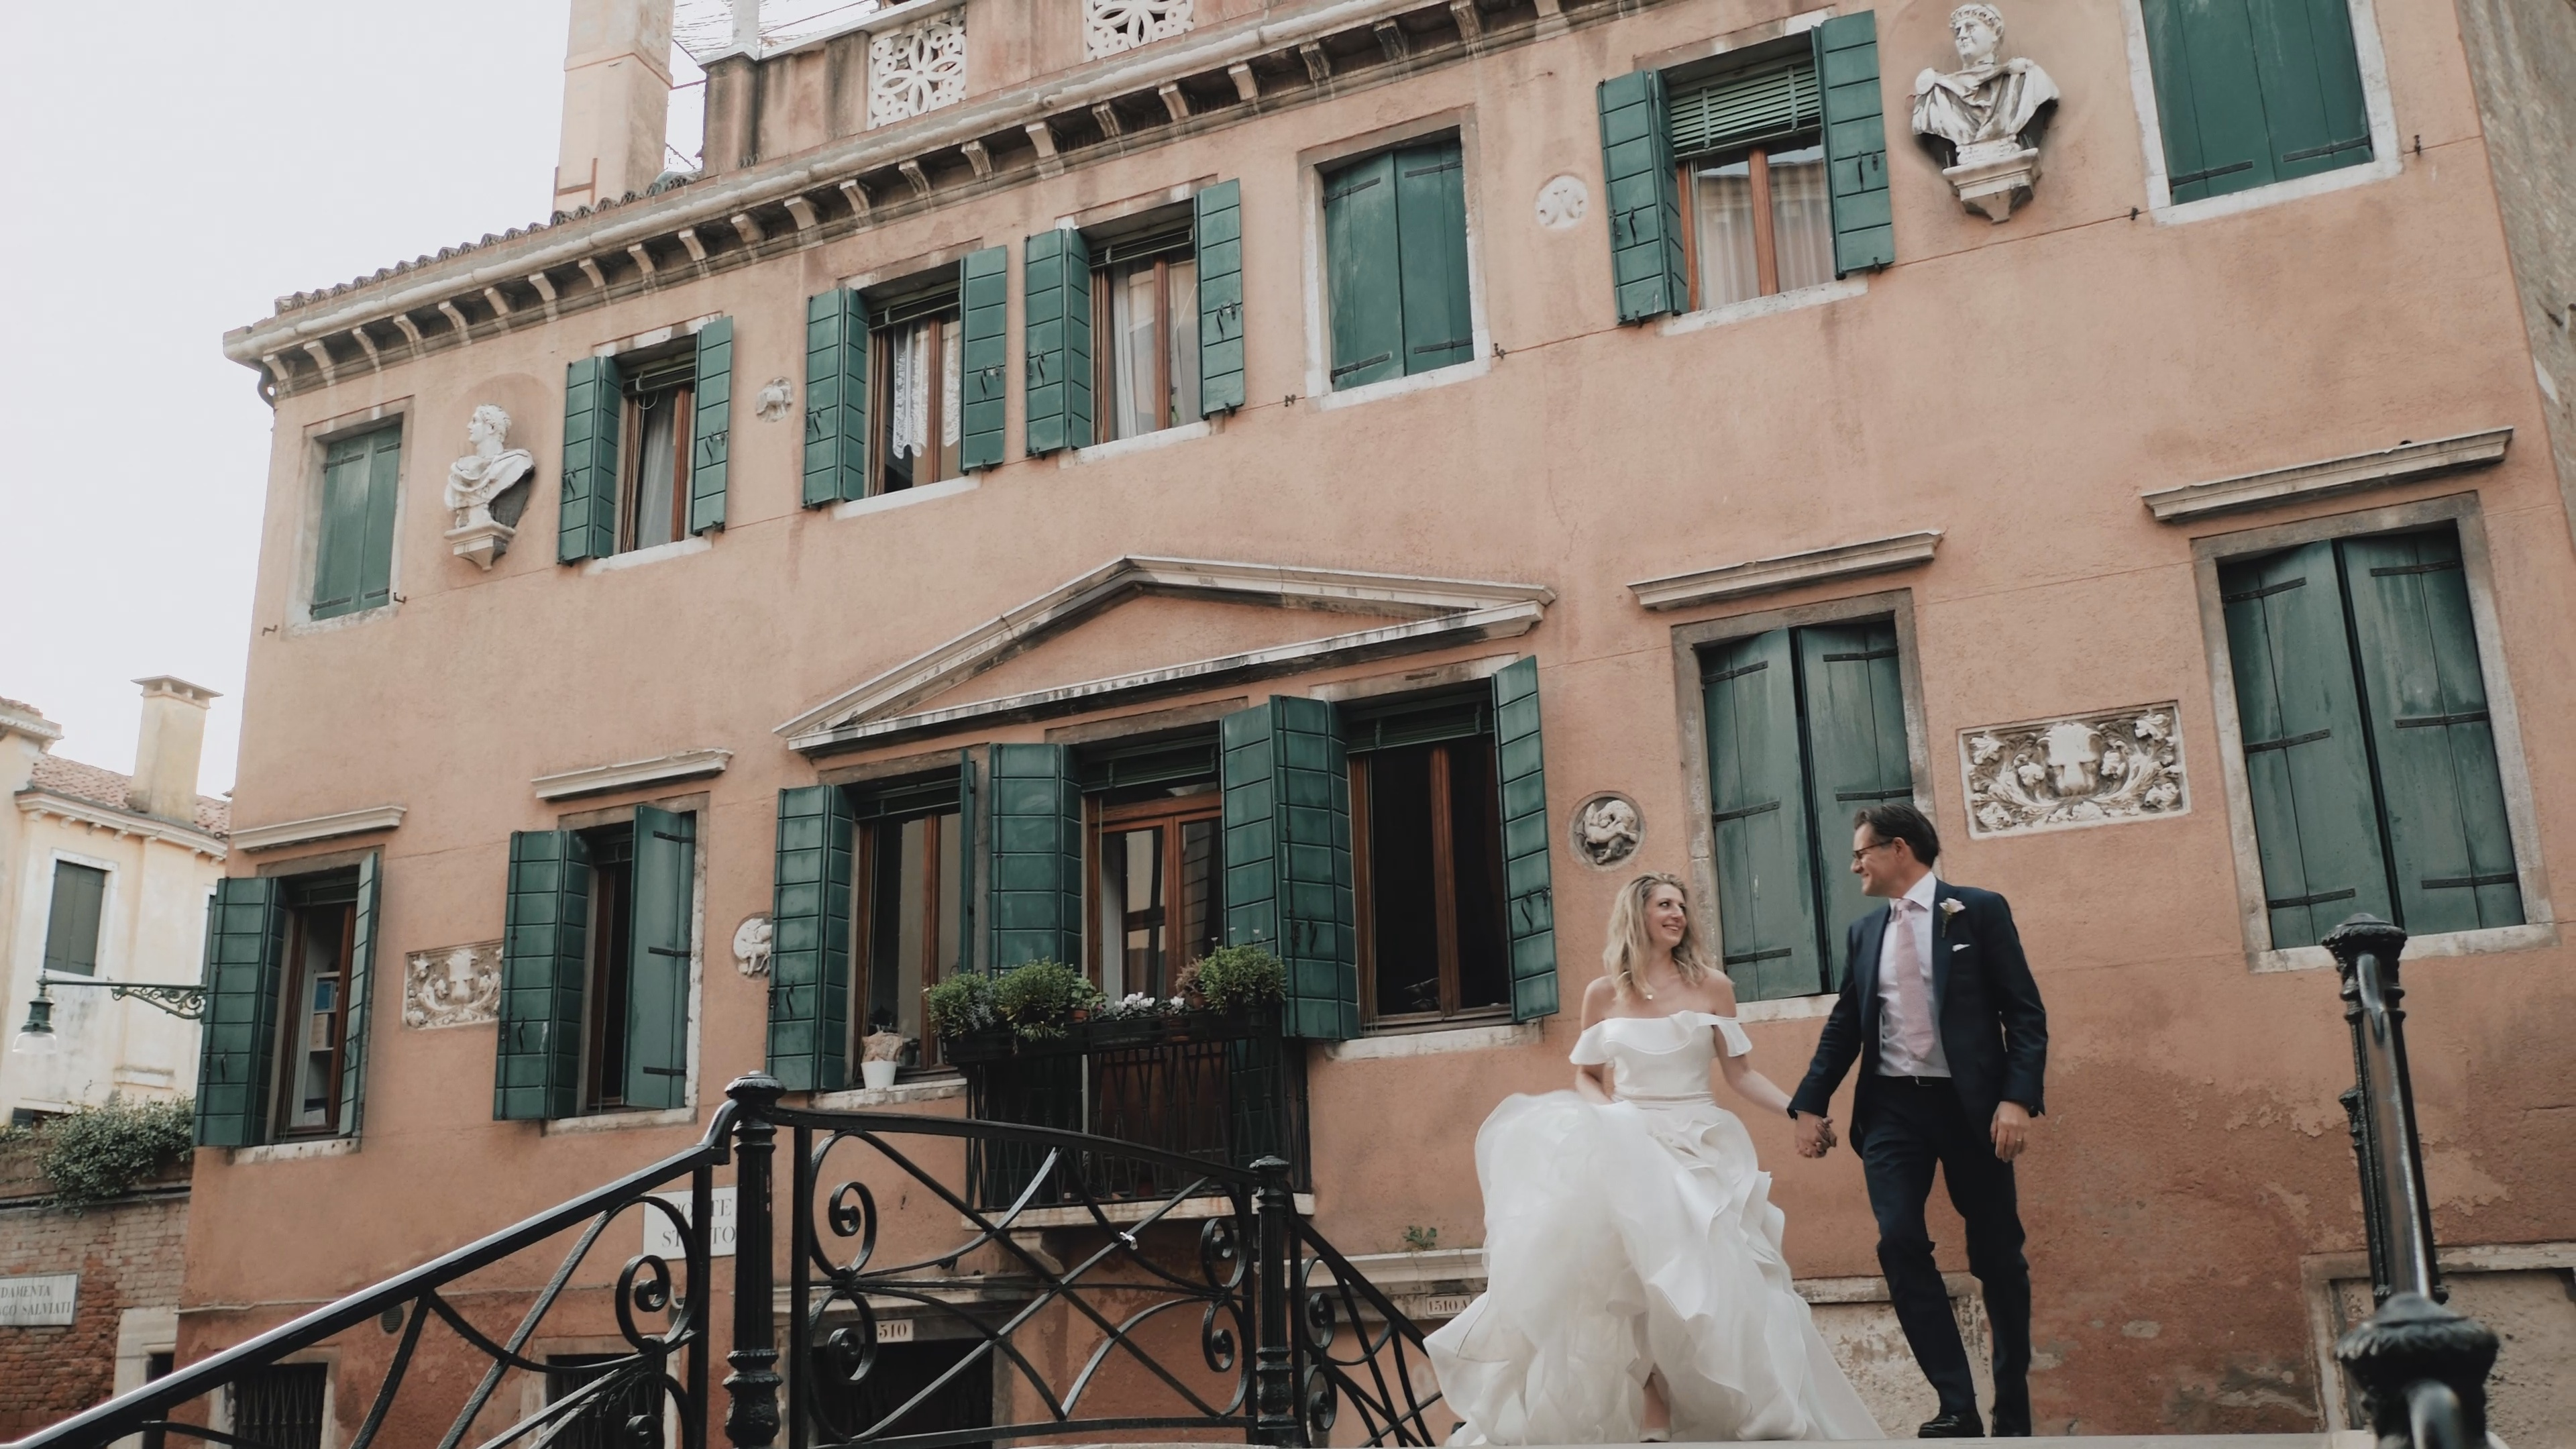 Erek + Irina | Metropolitan City of Venice, Italy | Hotel Aman